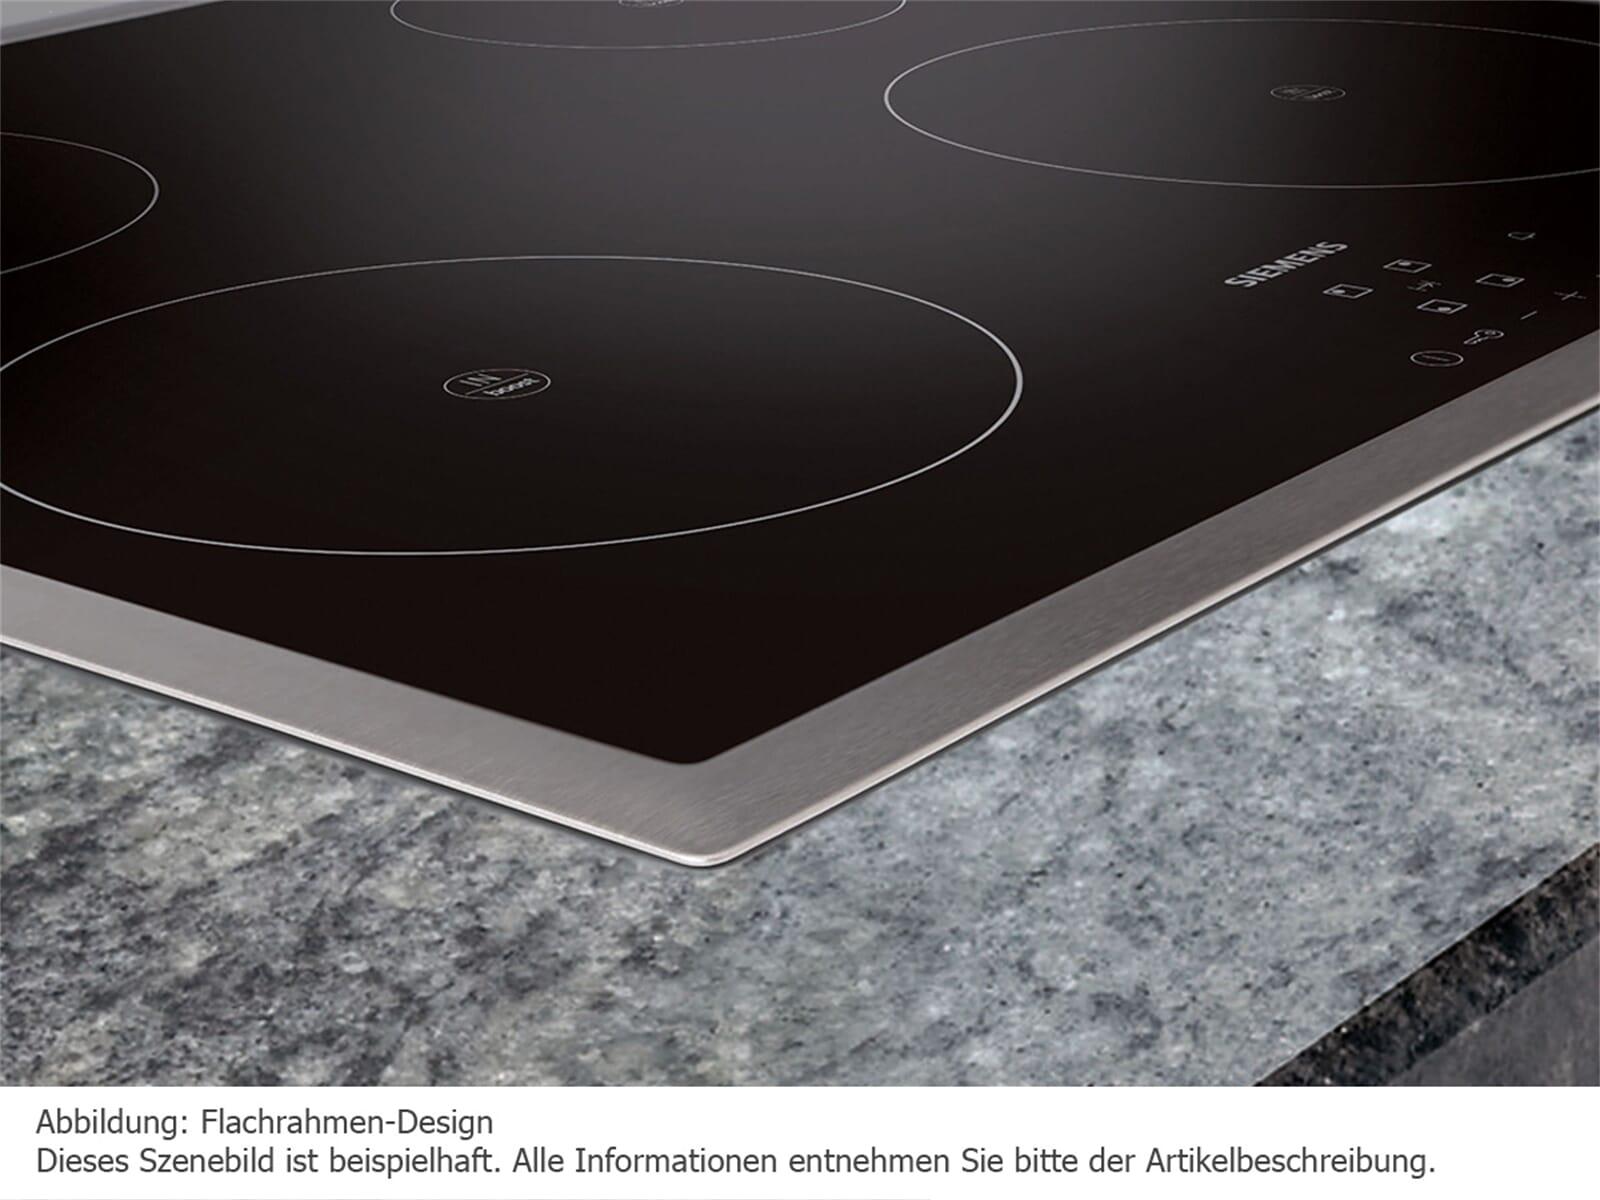 siemens et645hn17 glaskeramik kochfeld autark br terzone touch bedienung ebay. Black Bedroom Furniture Sets. Home Design Ideas